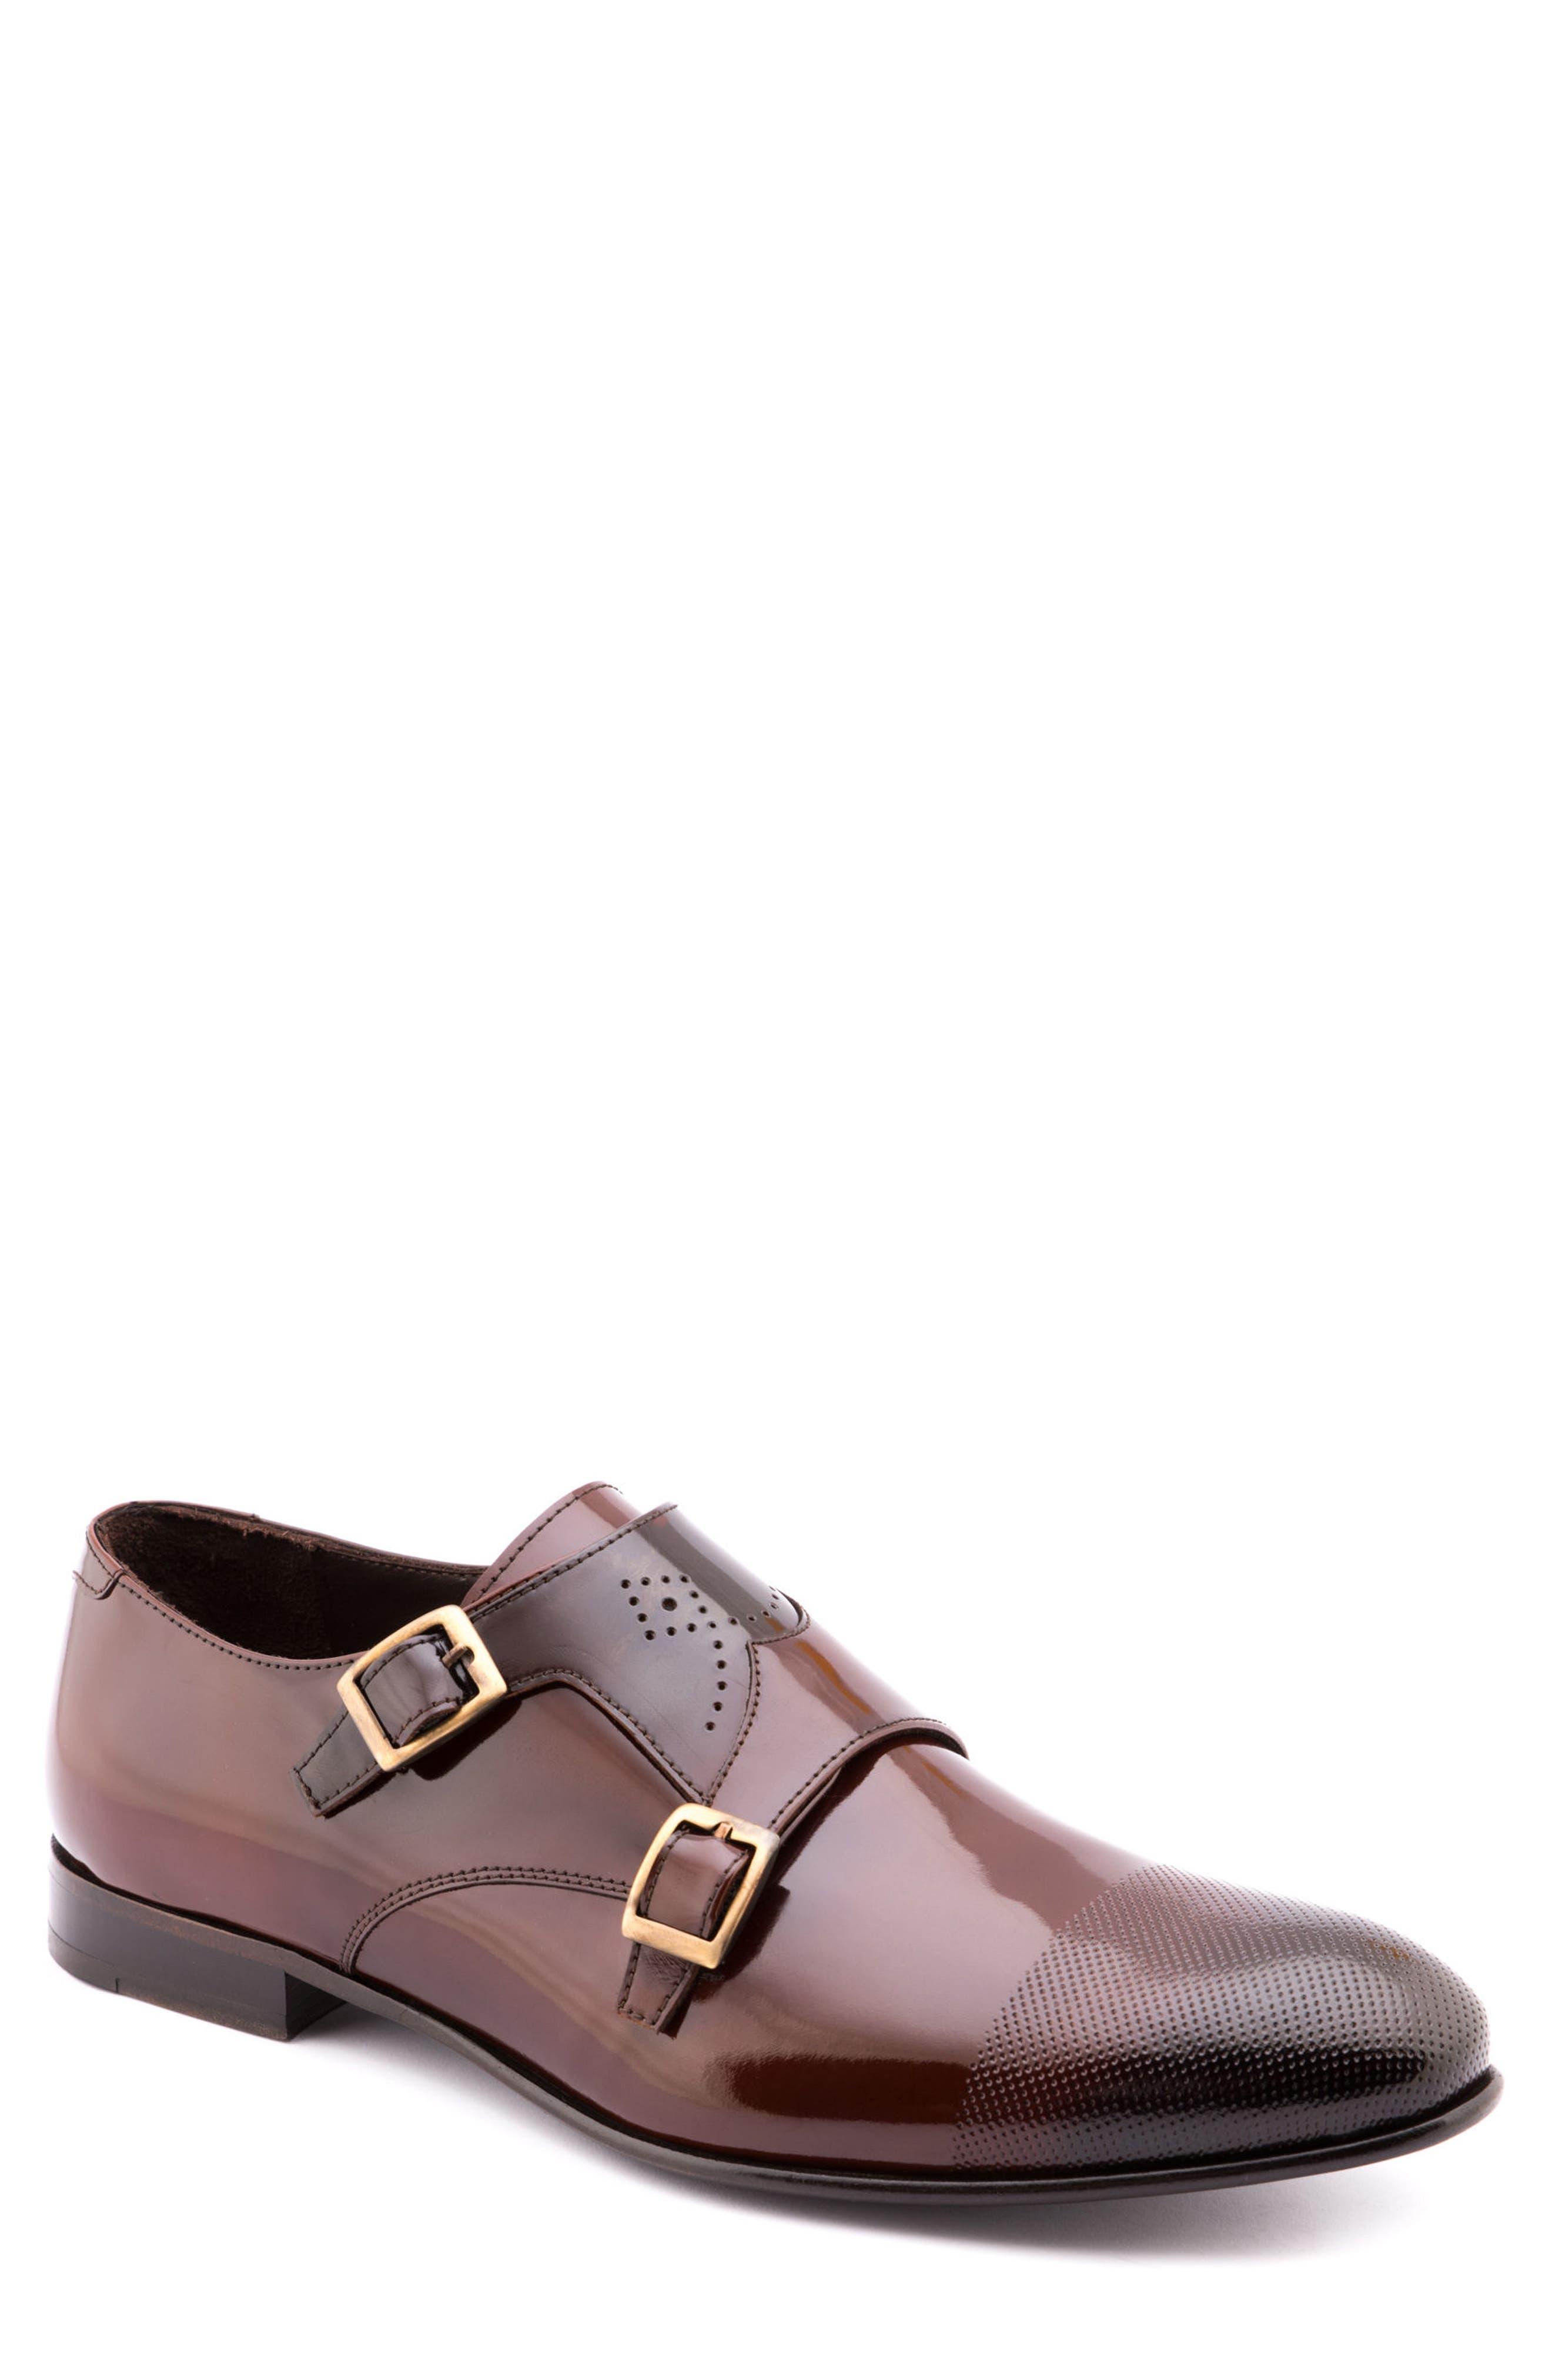 Martin Double Monk Strap Shoe,                             Main thumbnail 1, color,                             Brown